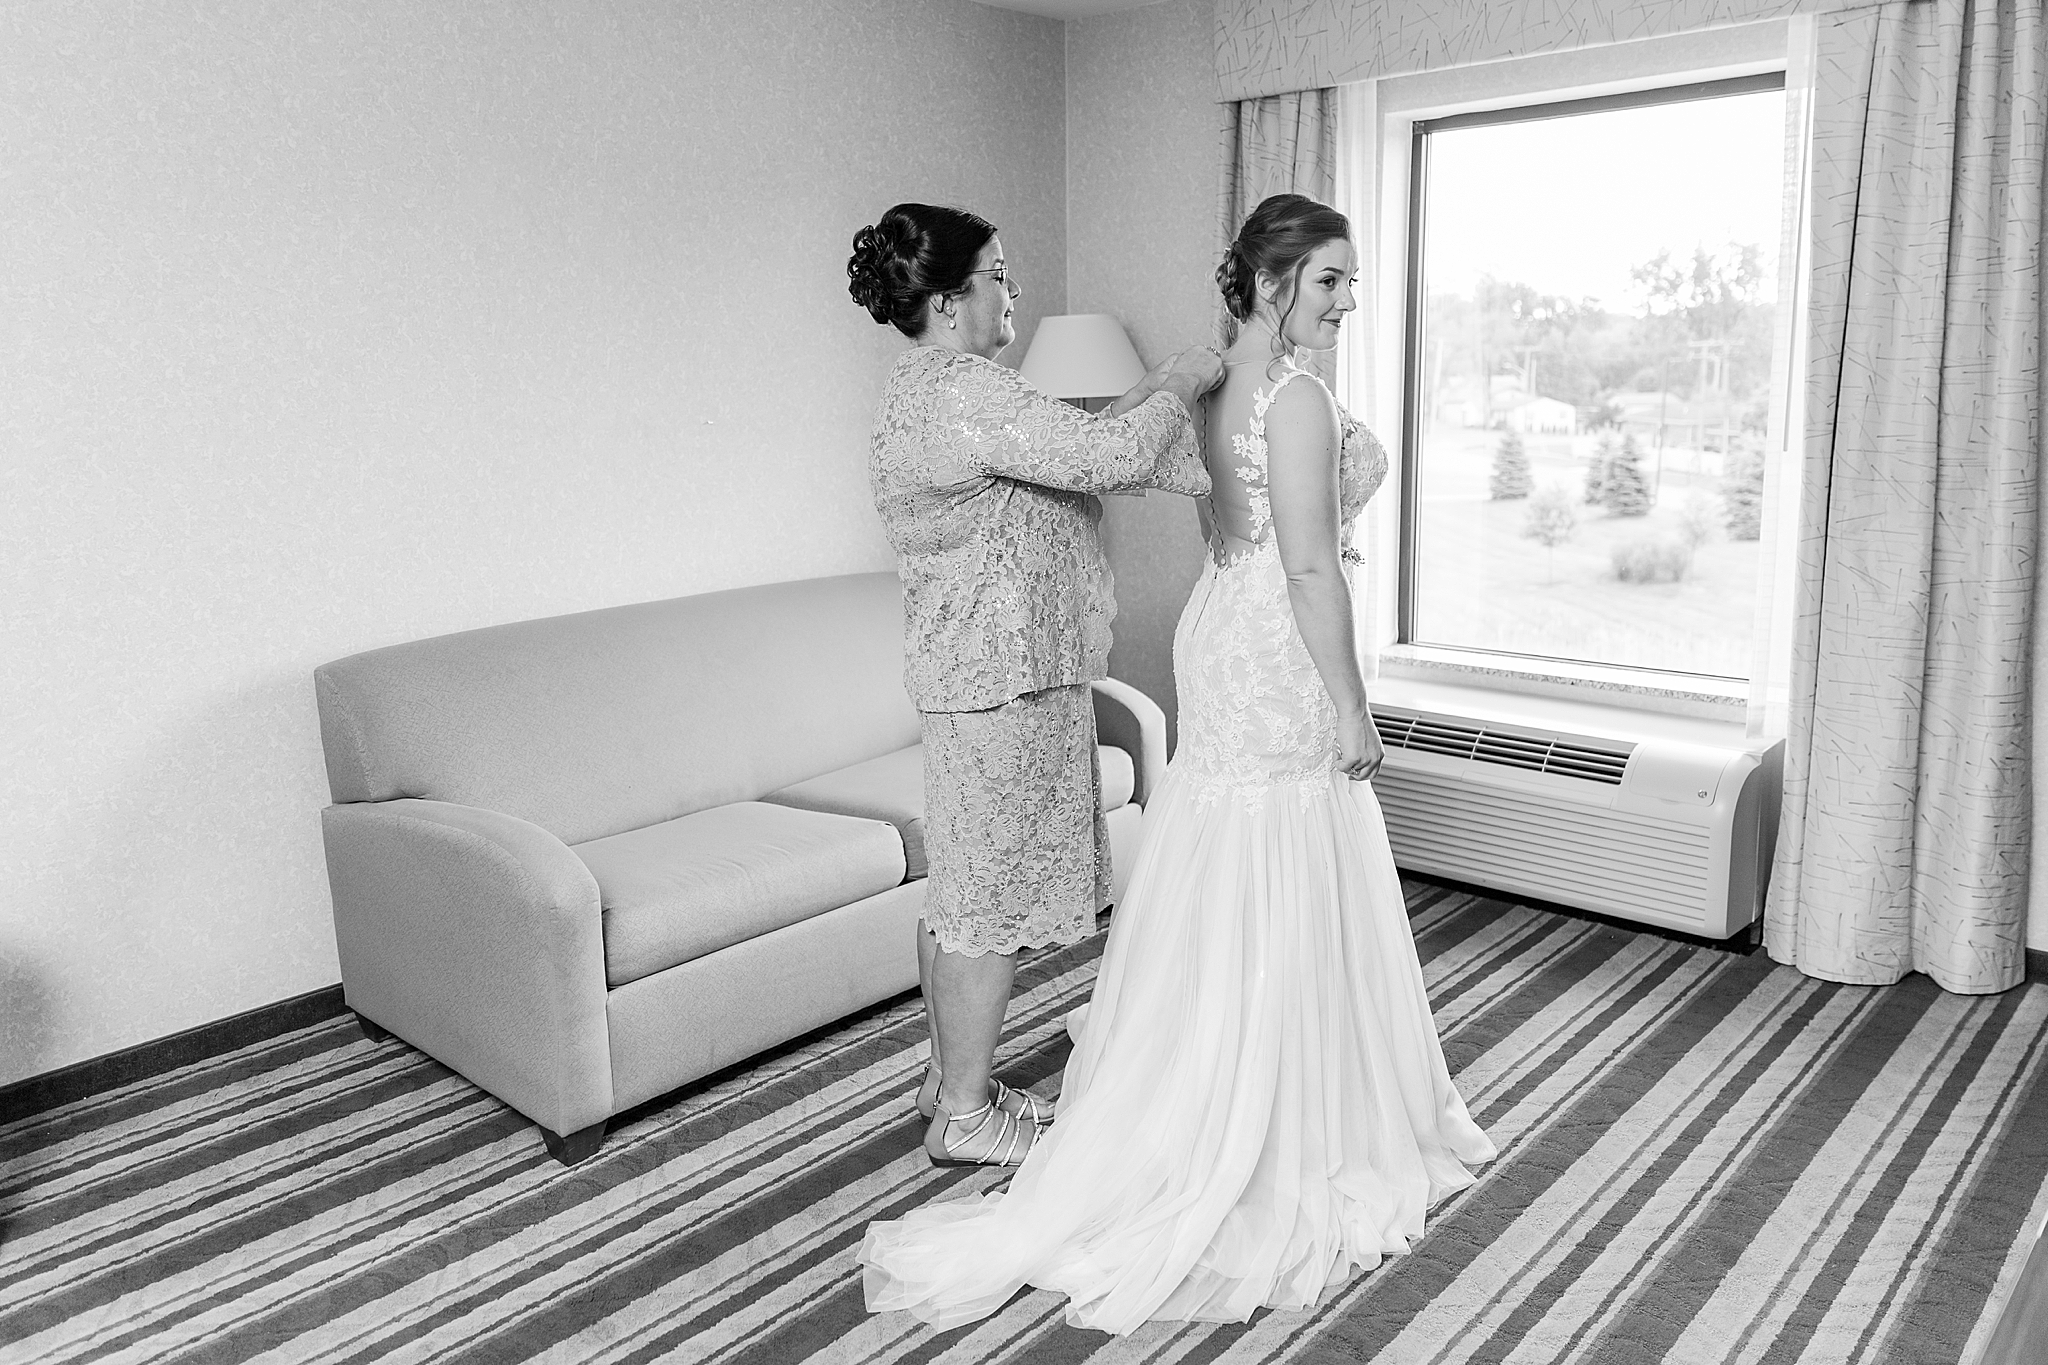 detroit-wedding-photographer-brownstown-event-center-wedding-photos-sam-josh-by-courtney-carolyn-photography_0011.jpg